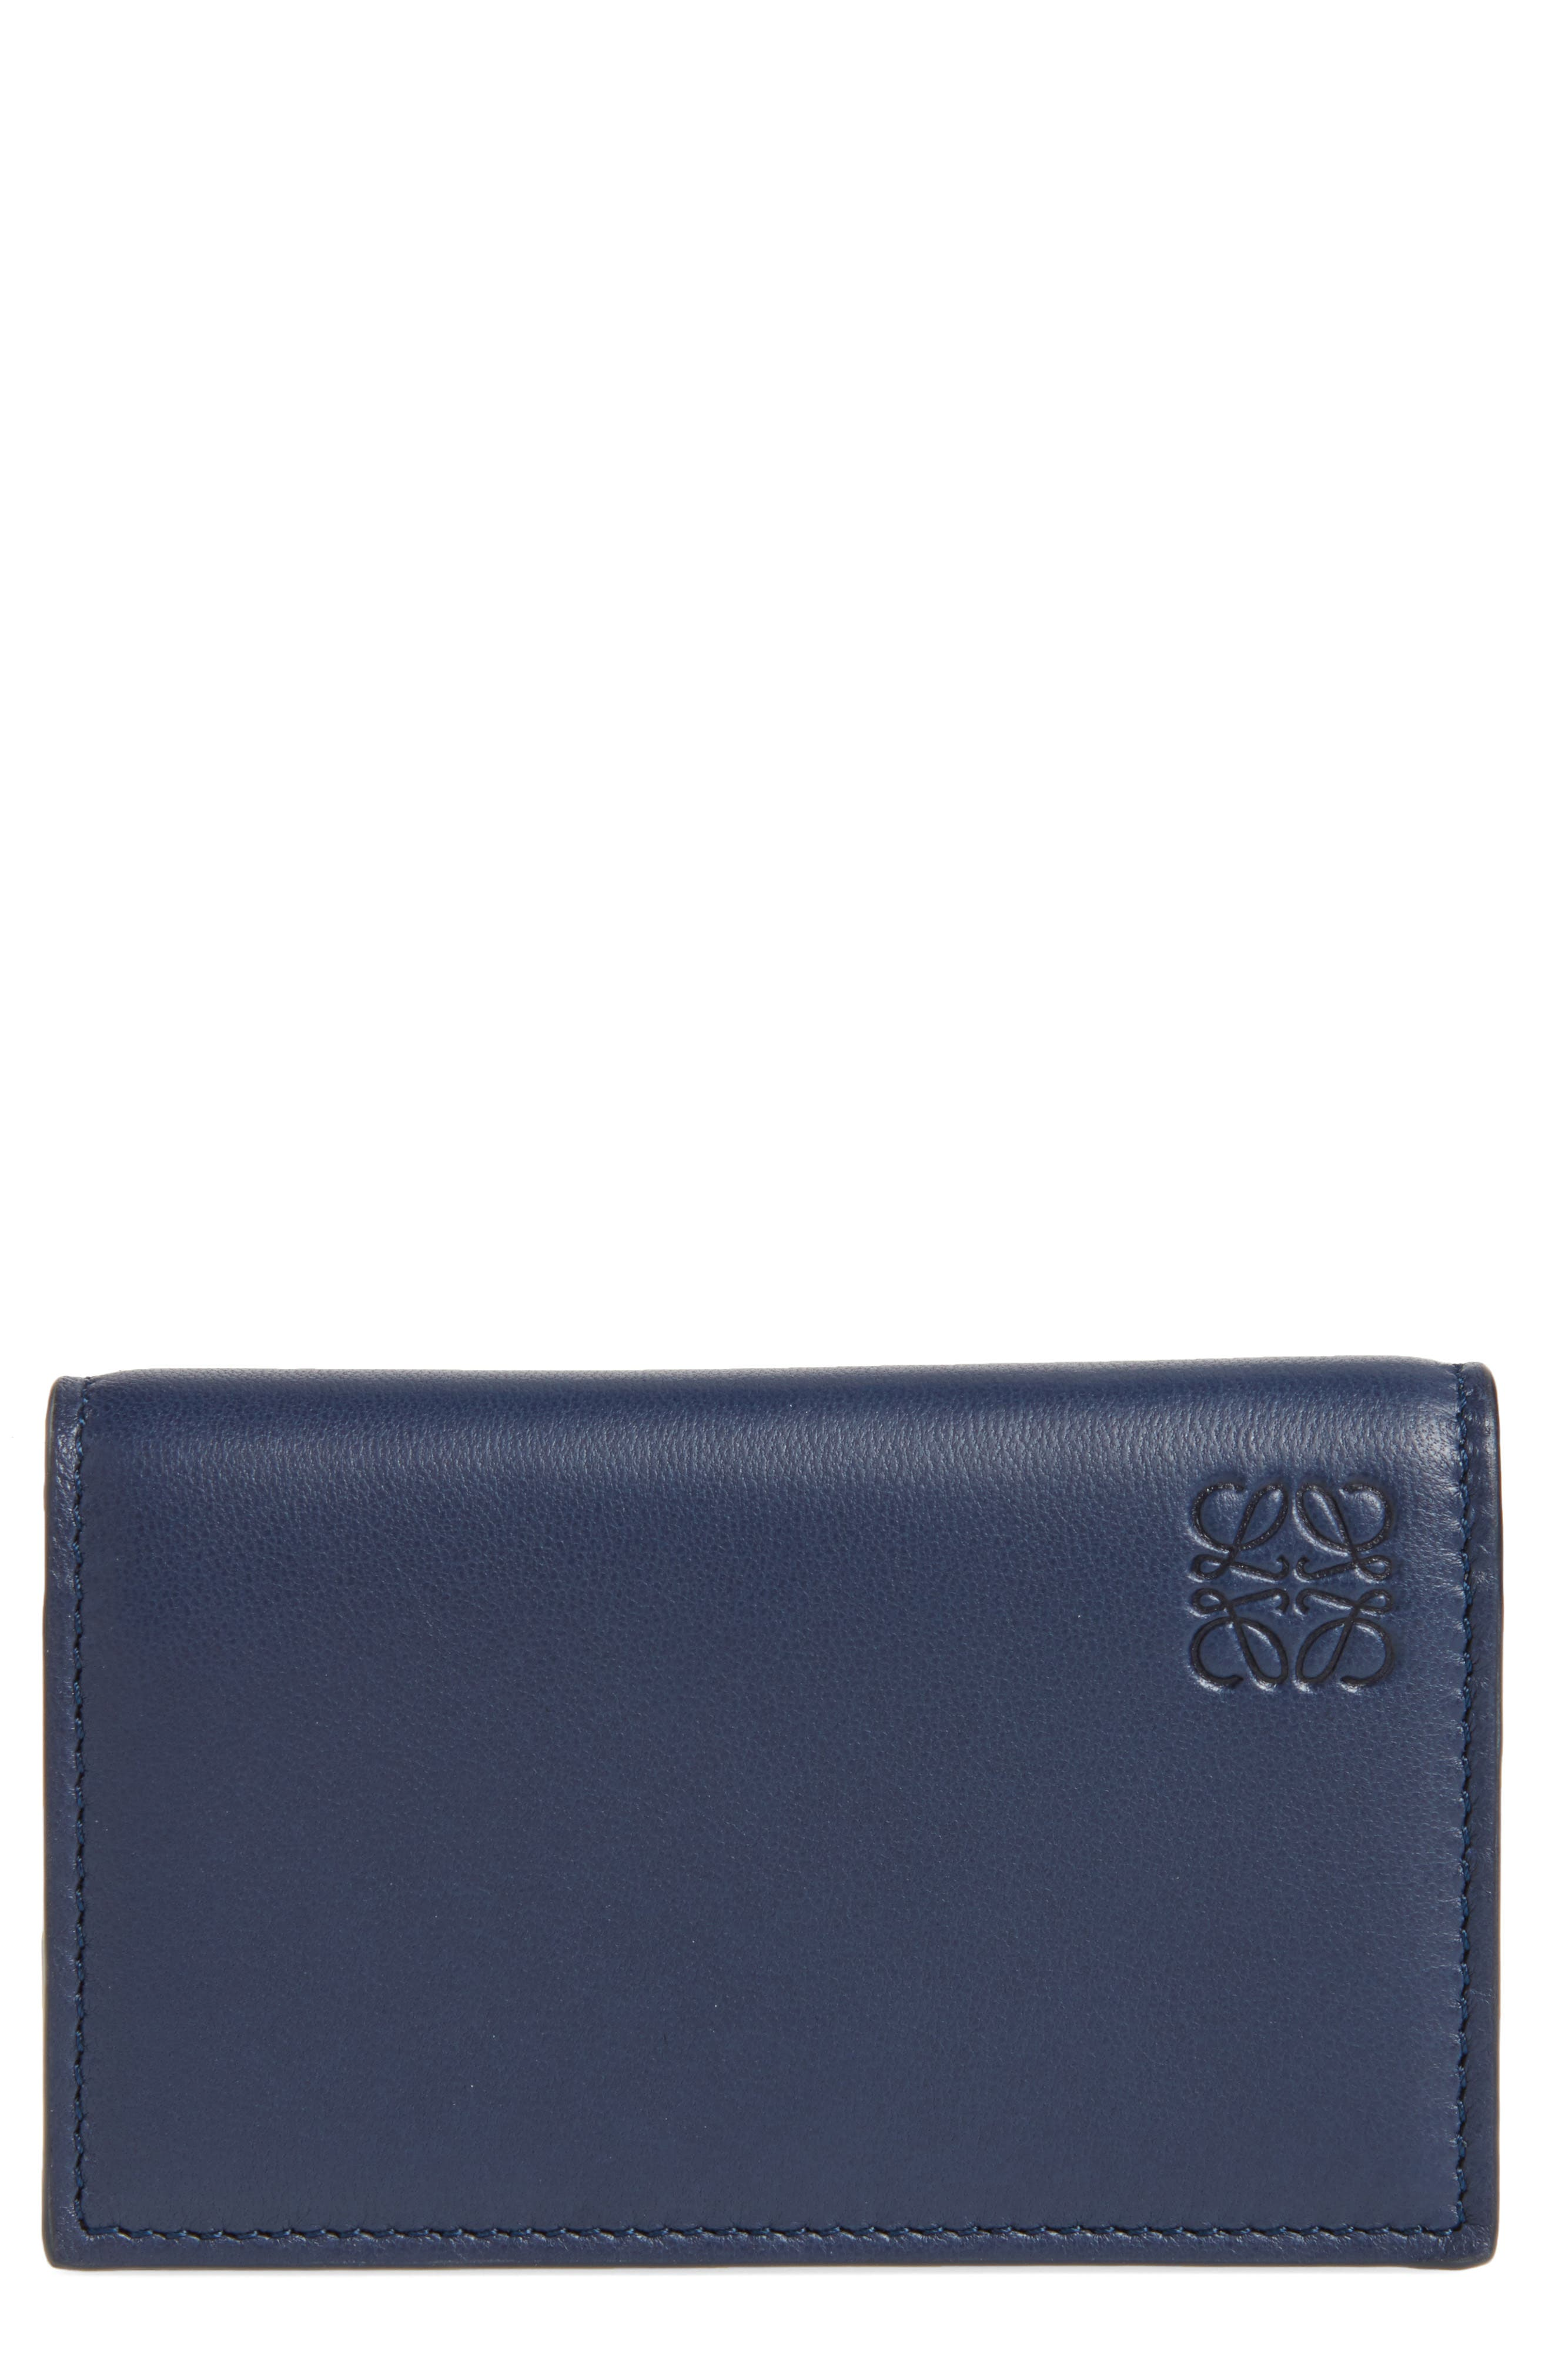 Loewe Calfskin Leather Business Card Case